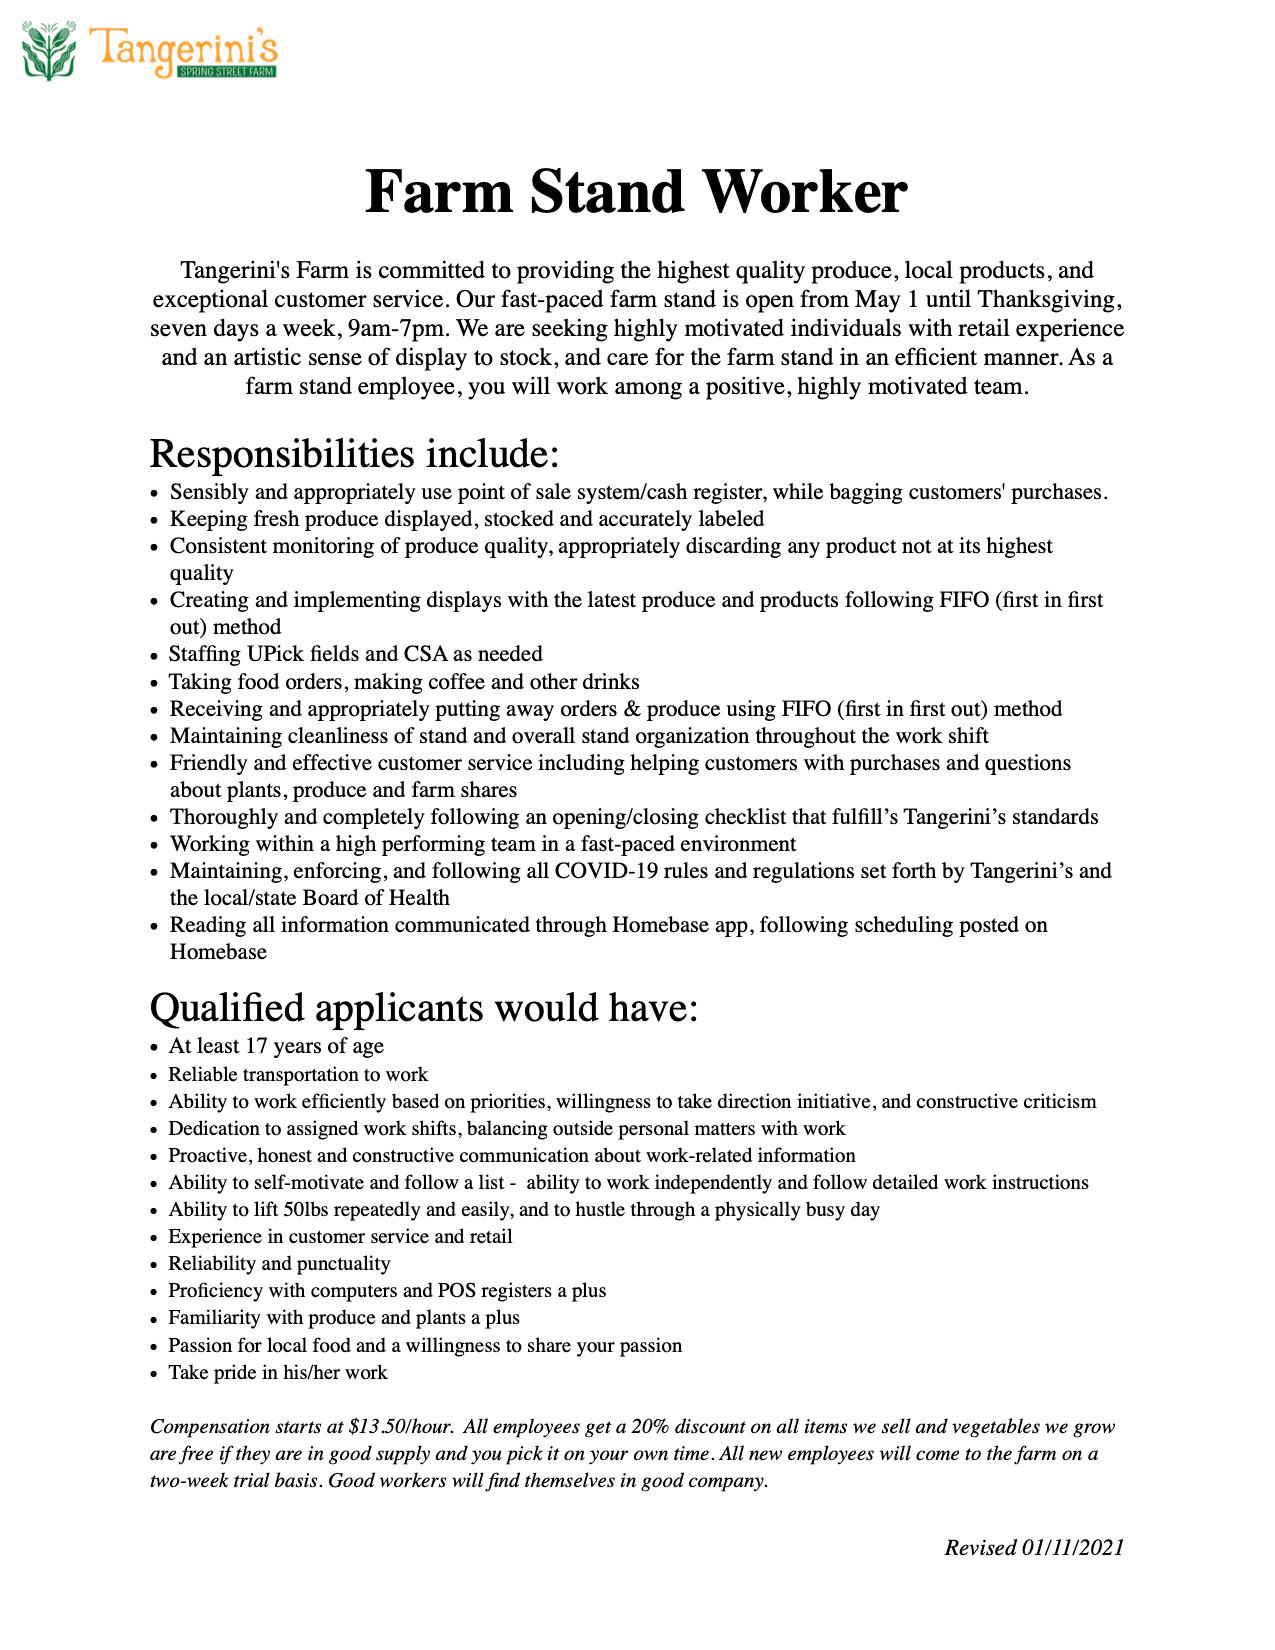 Farm Stand Worker Job Description.jpg